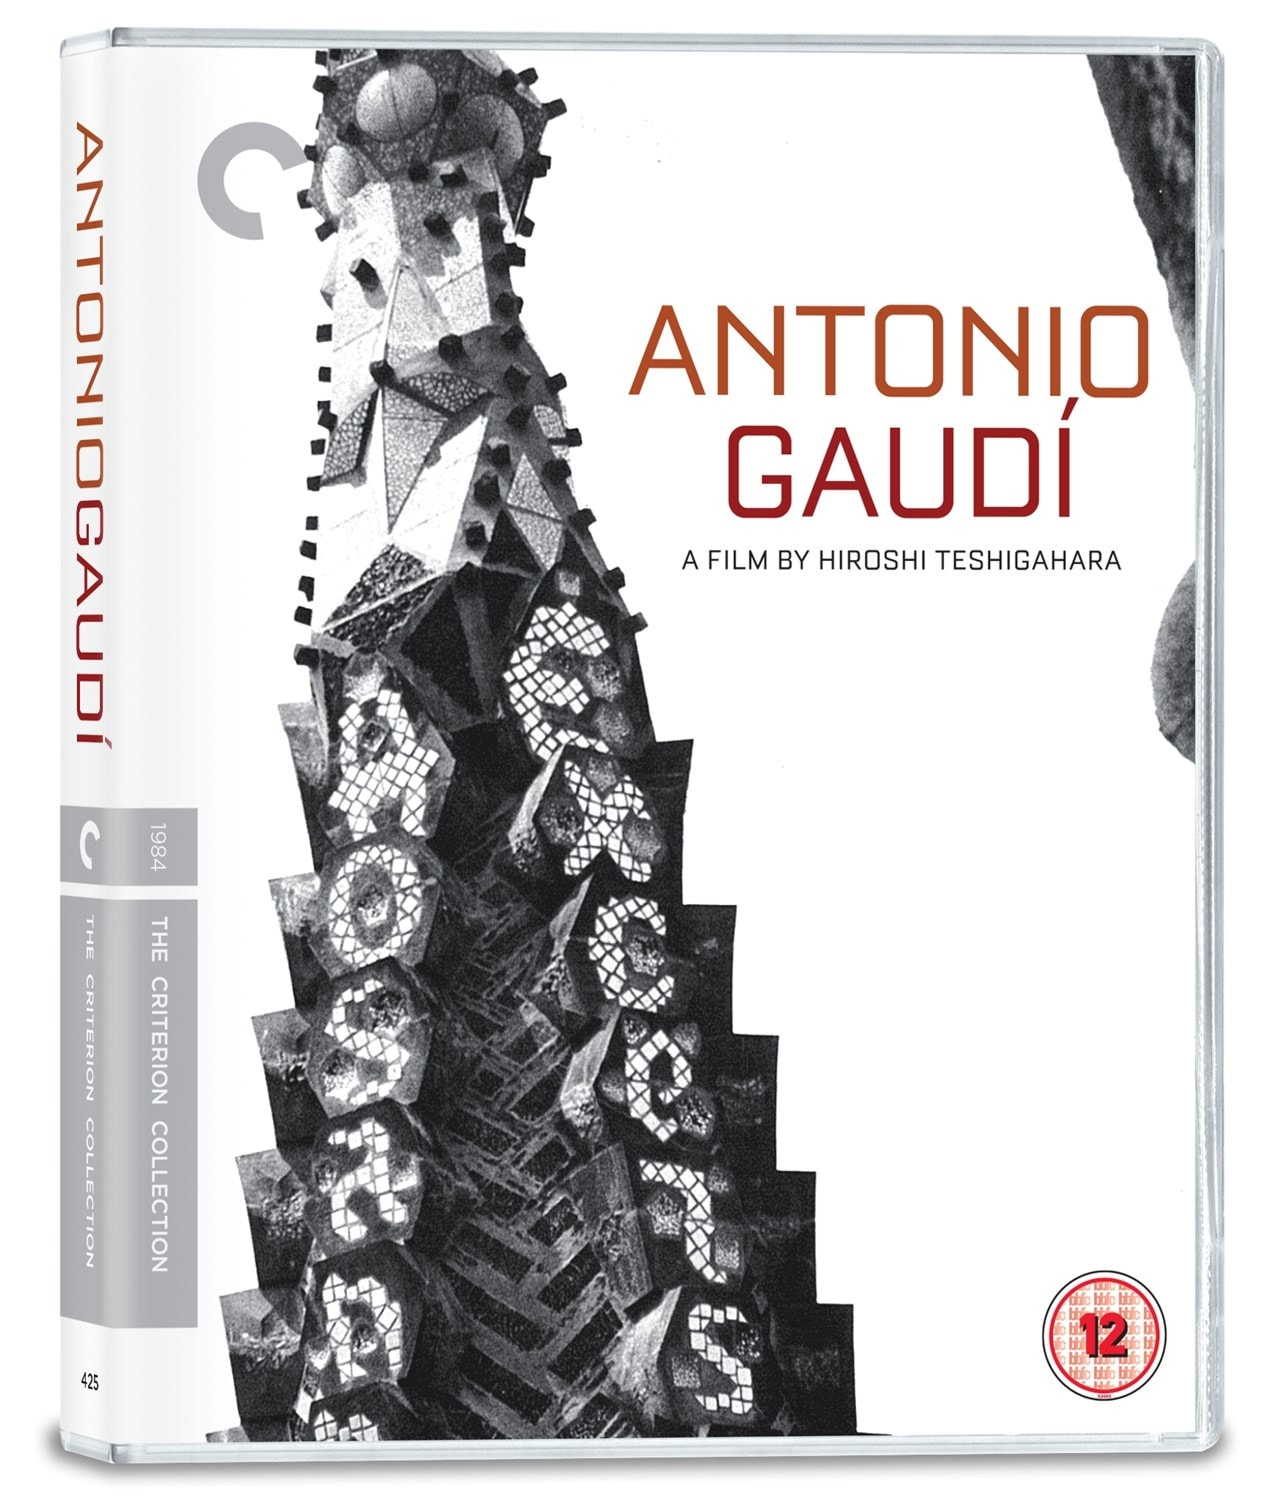 Antonio Gaudi - The Criterion Collection - 2